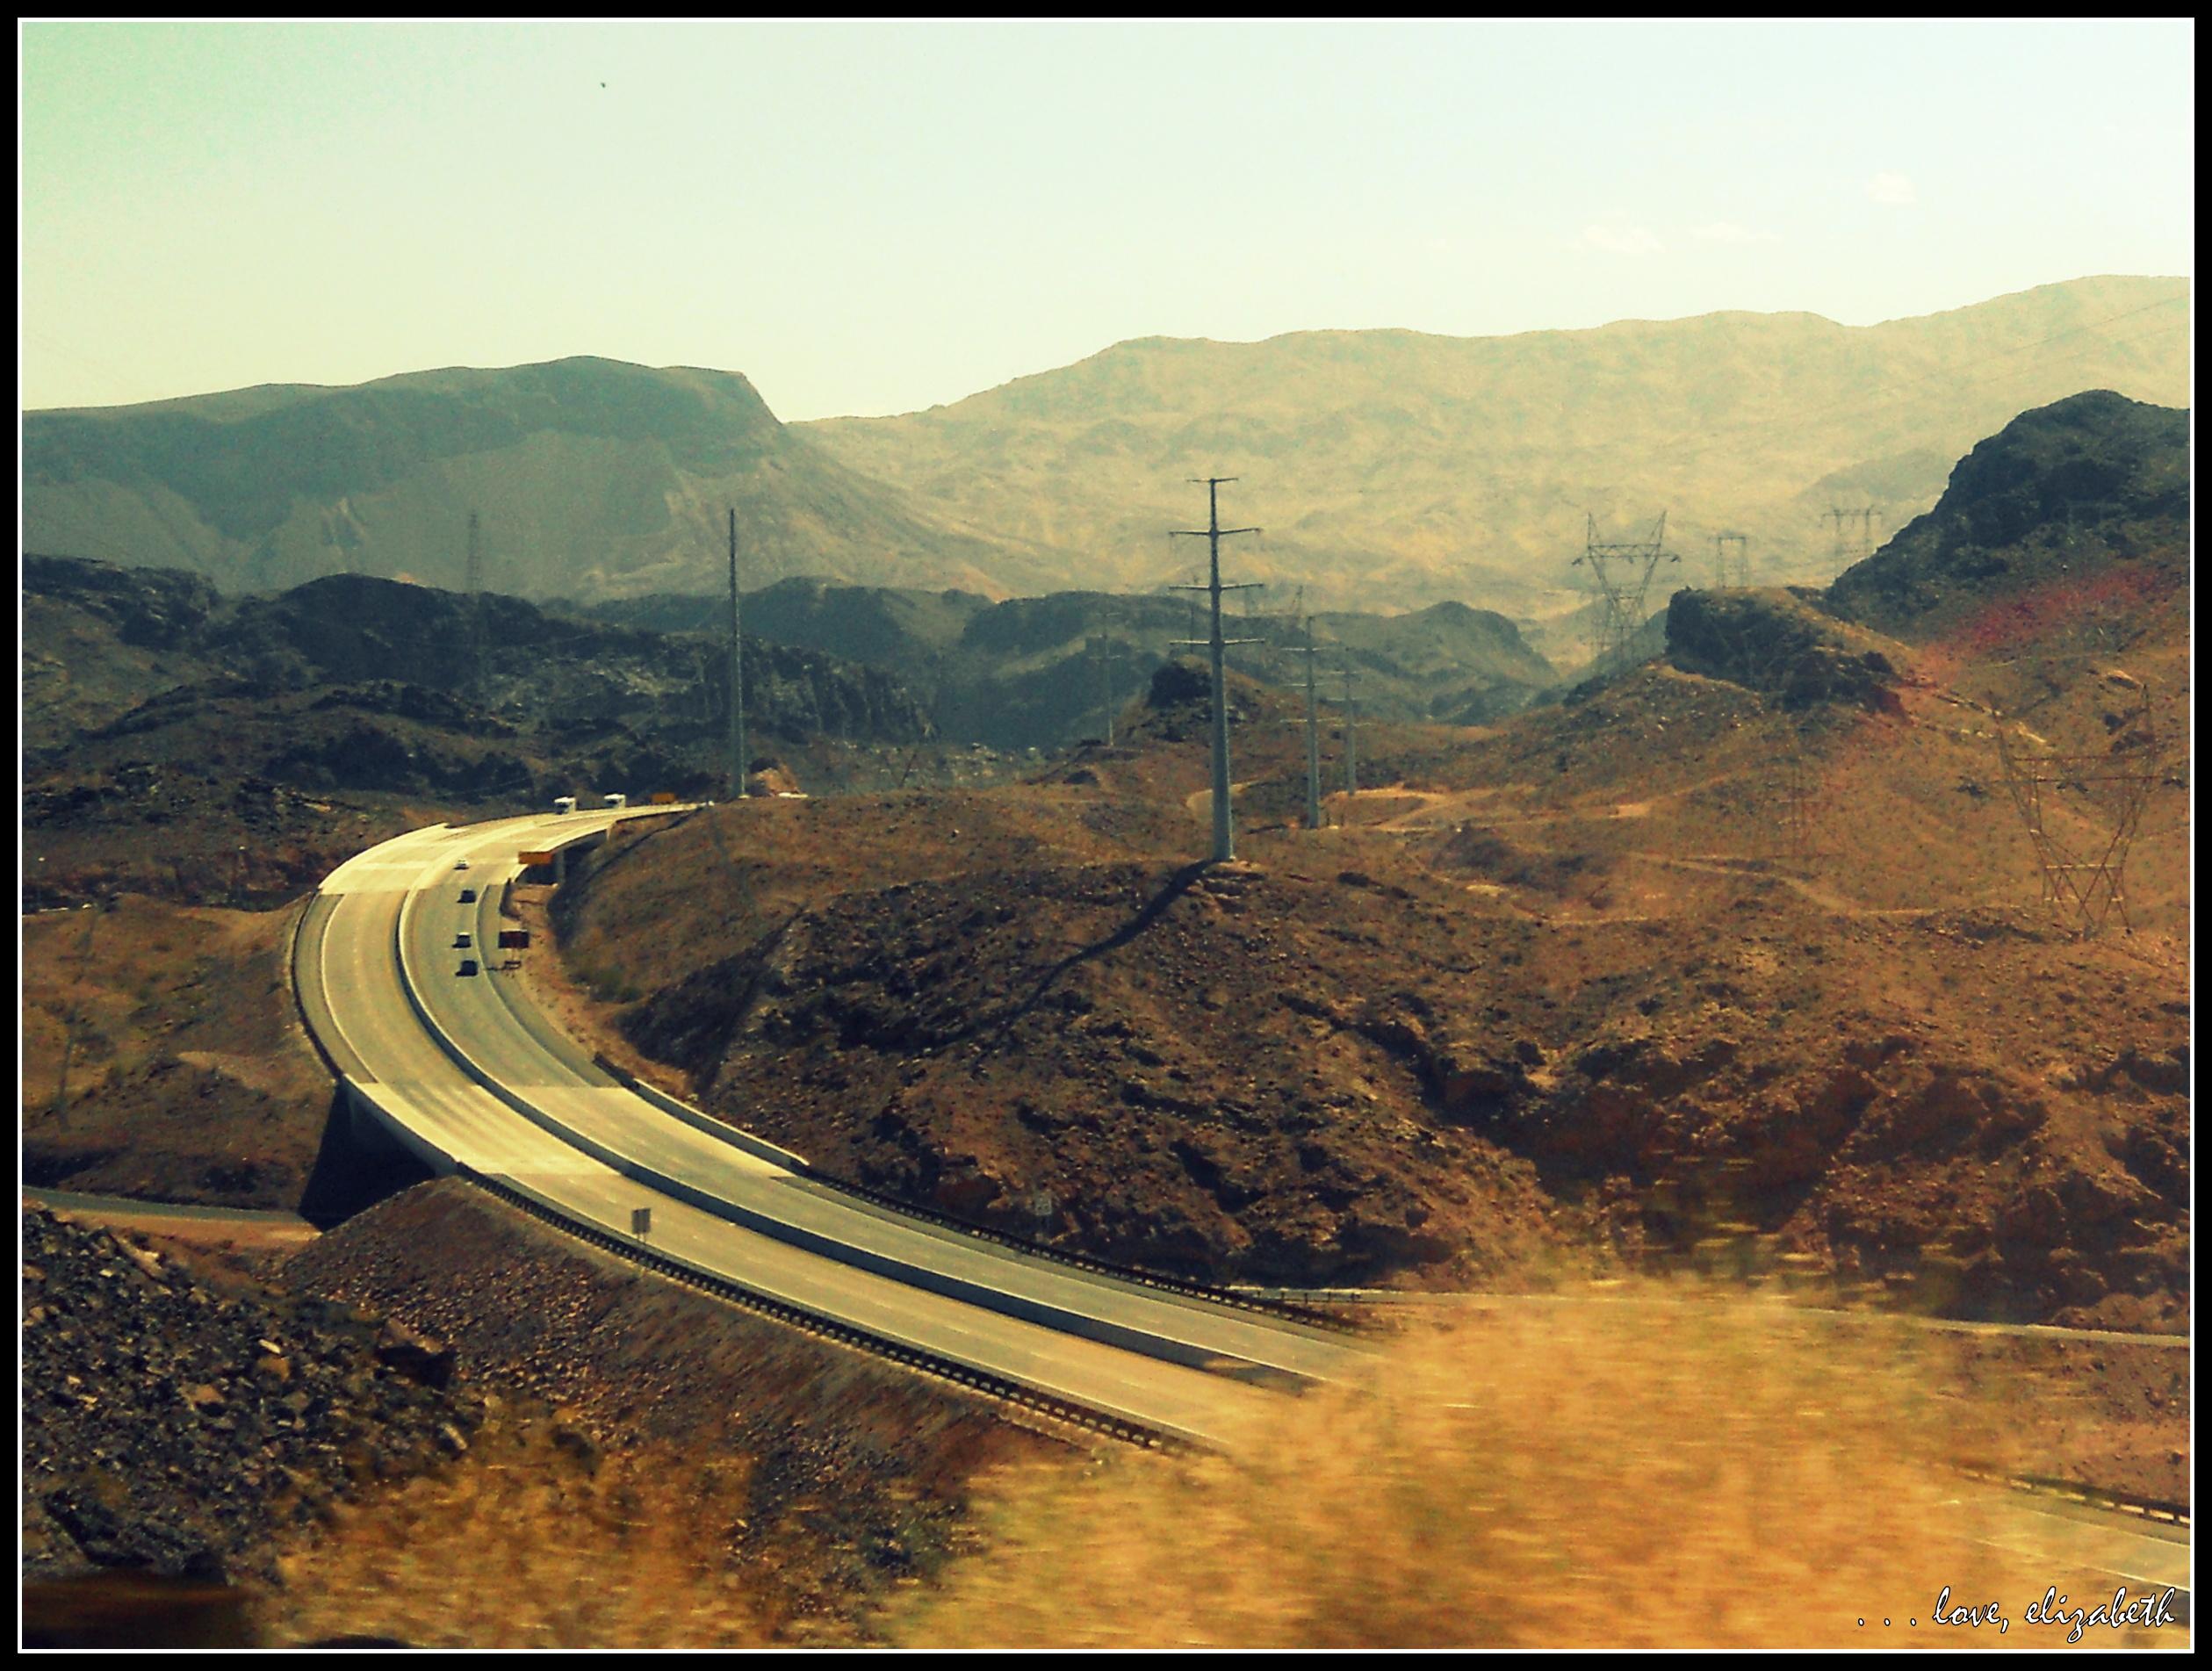 The 10 Commandments of Road Trips